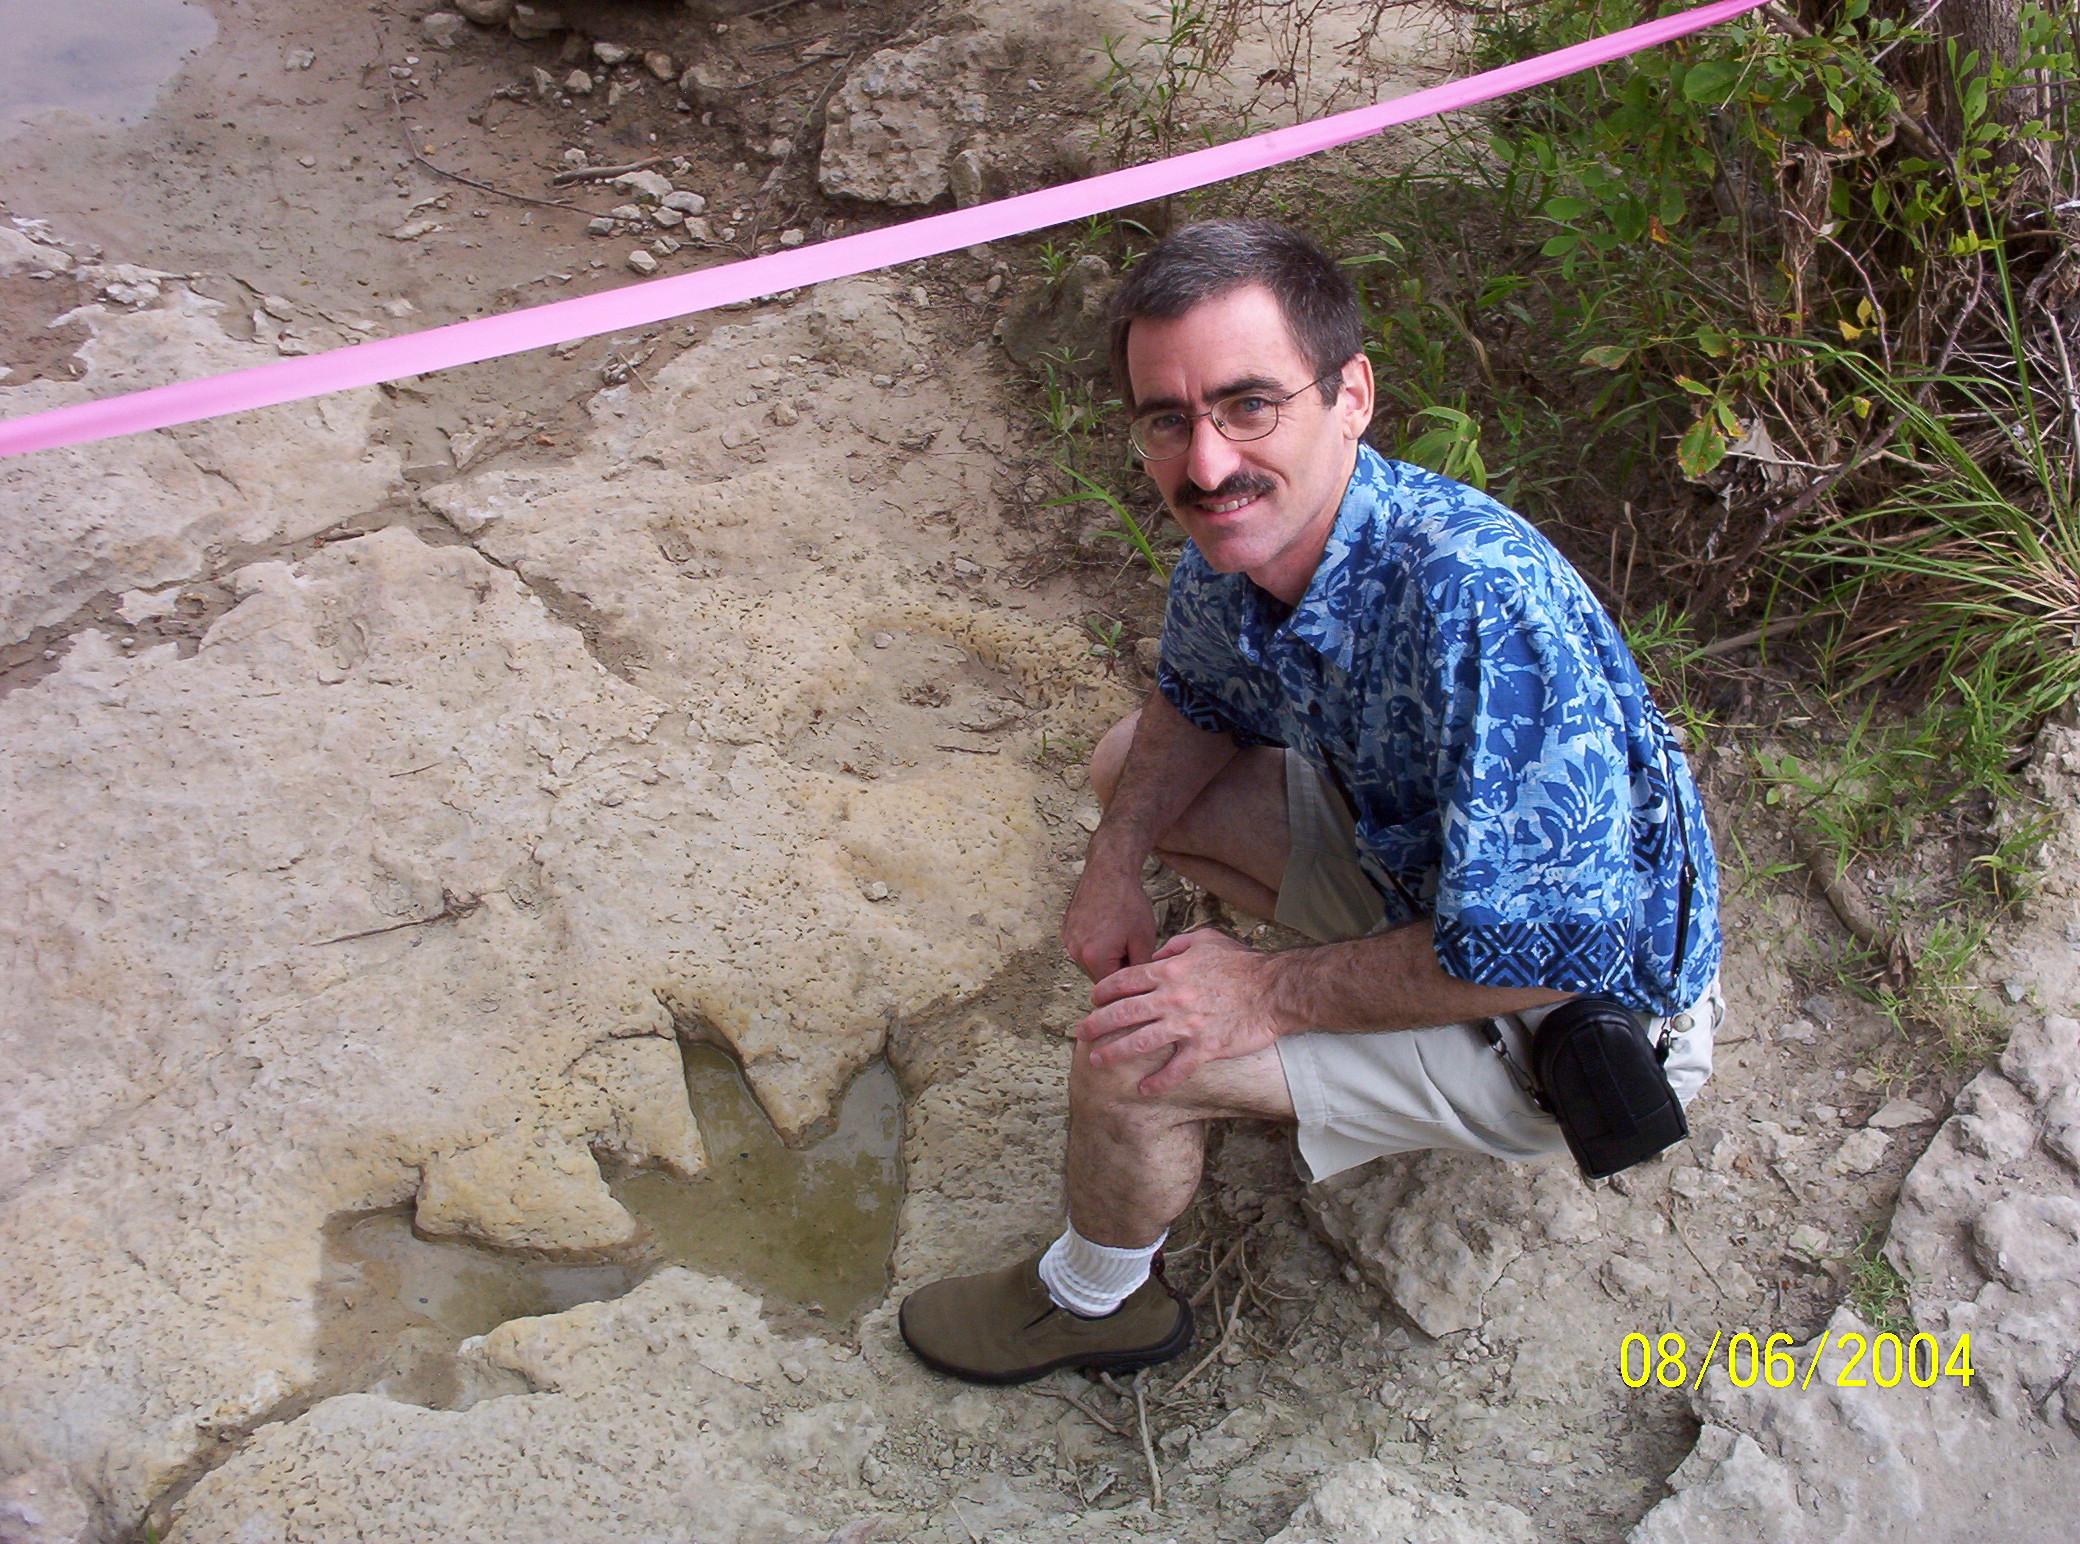 Paluxy Tracks - Unsolved Mysteries In The World  |Paluxy Evidence